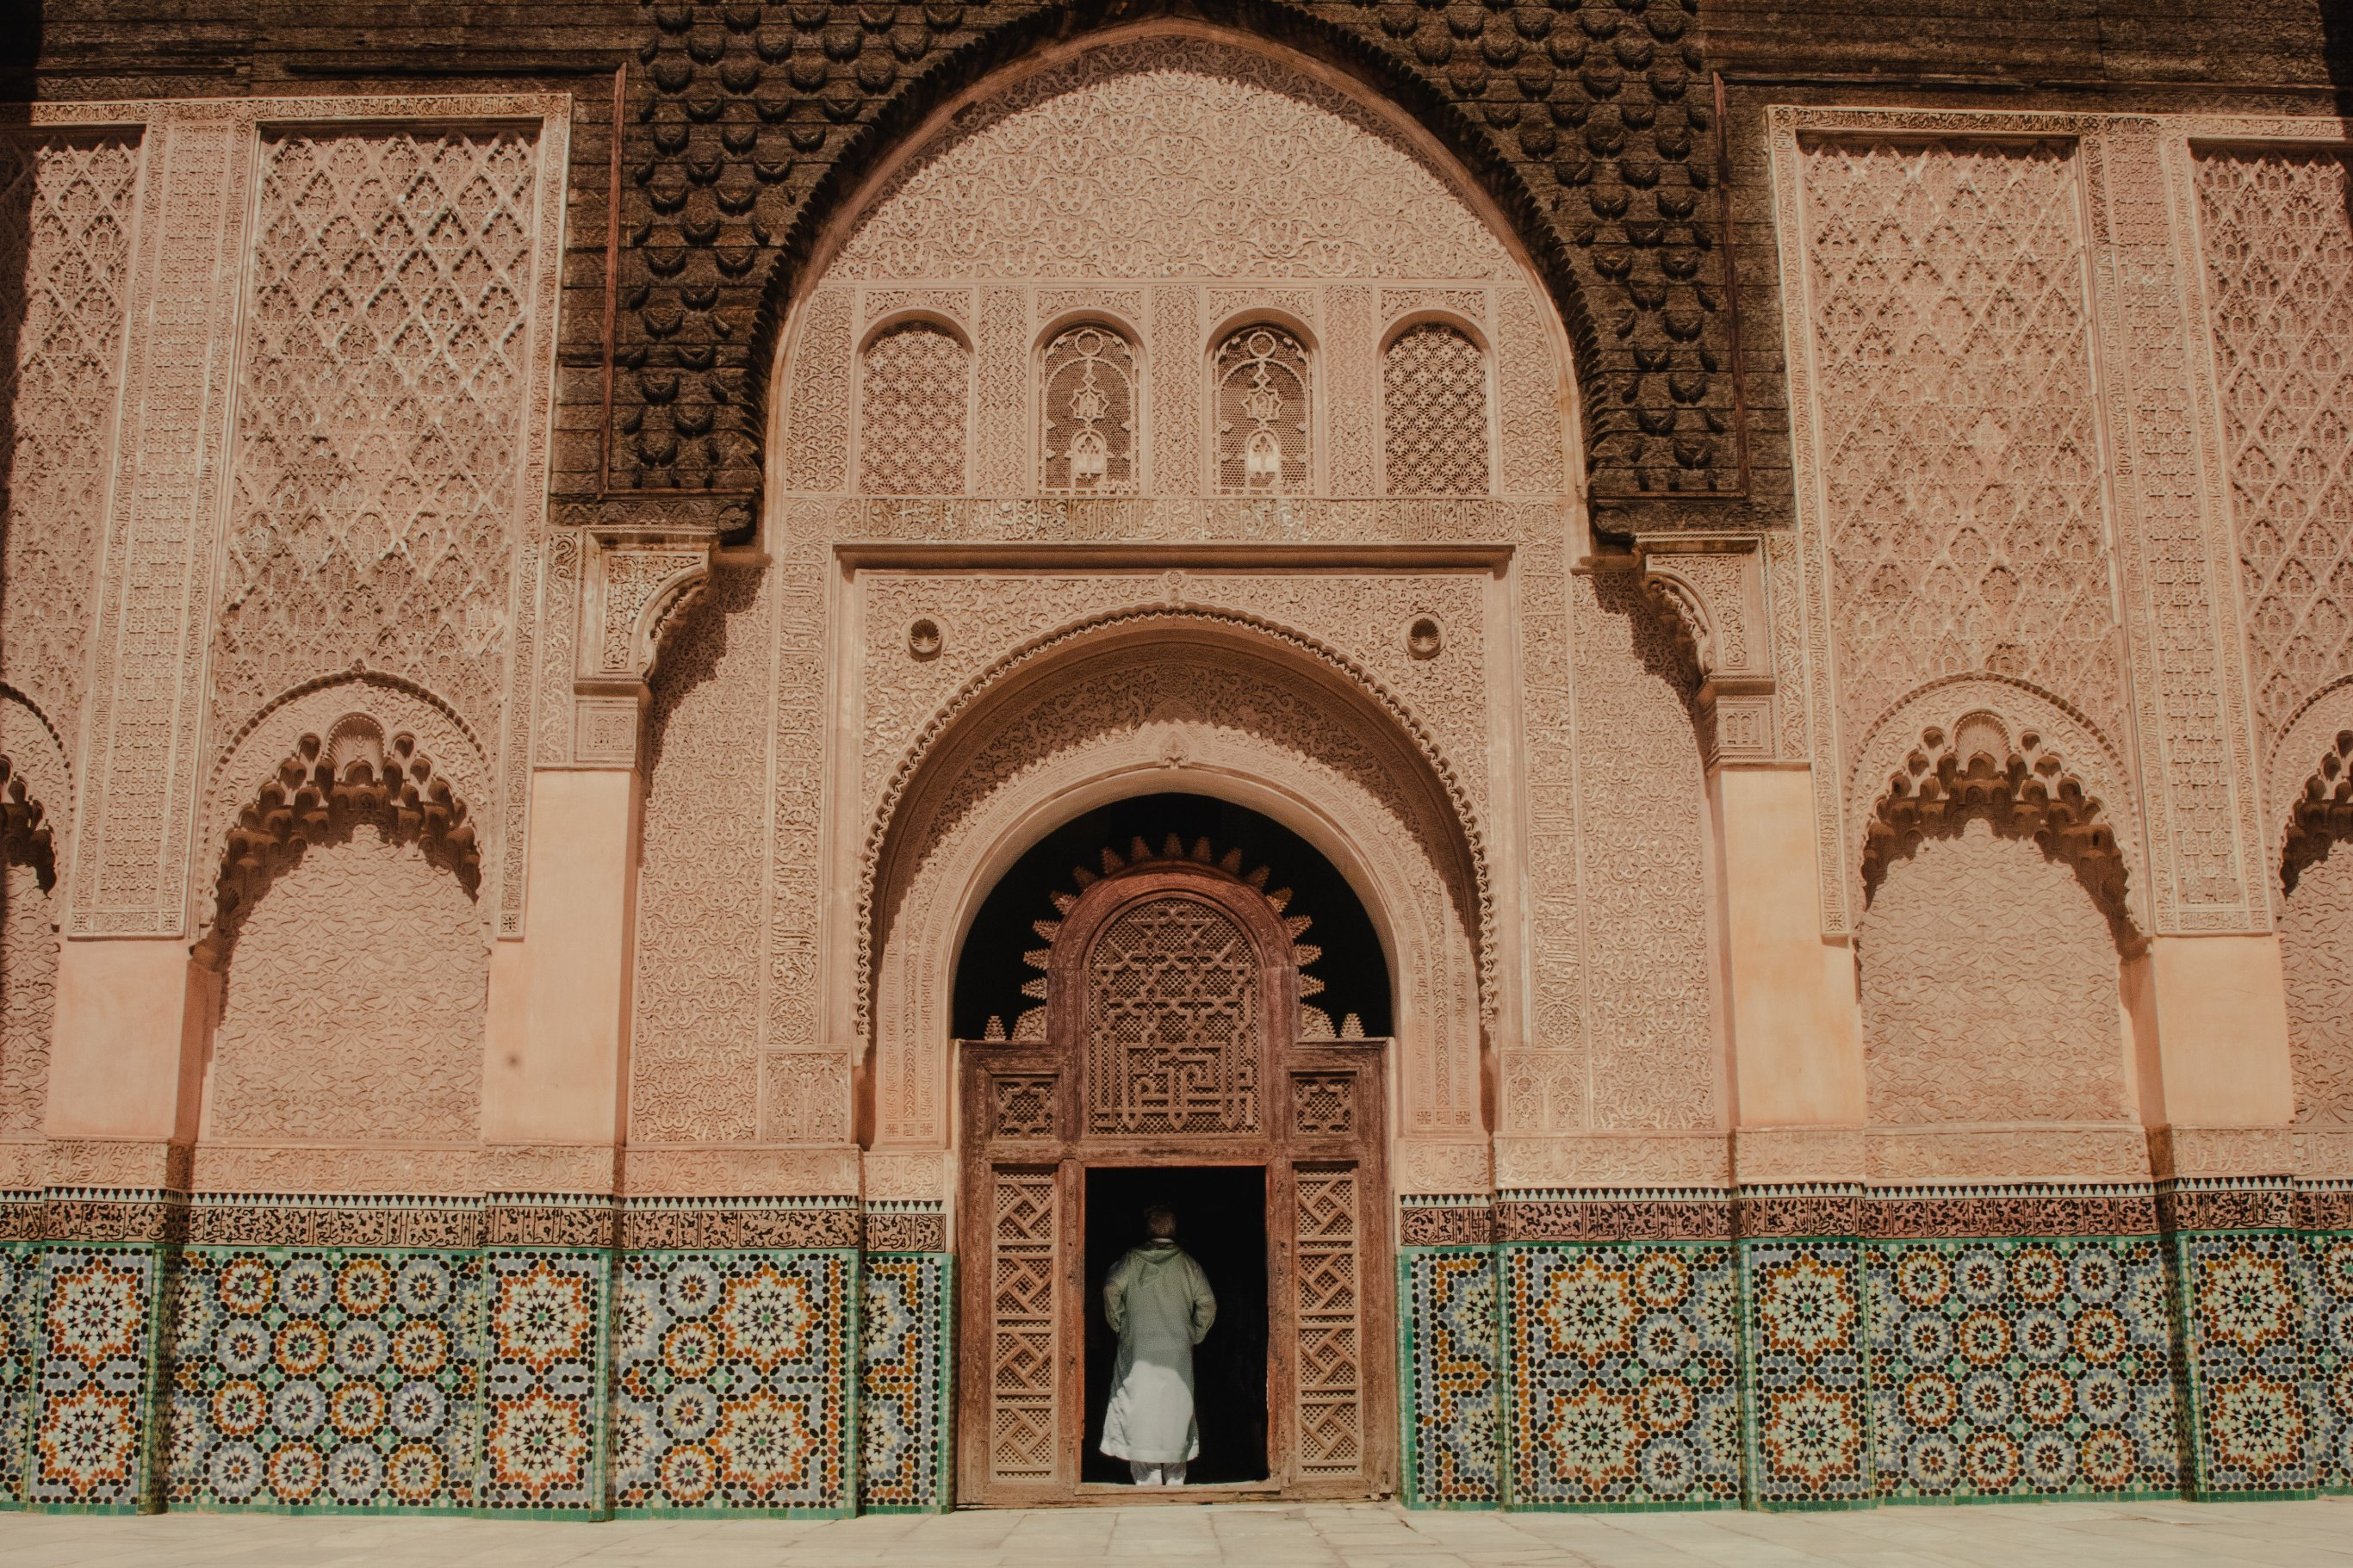 7-Day Romantic Getaway to Agafay Desert & Marrakesh - Morocco Itinerary